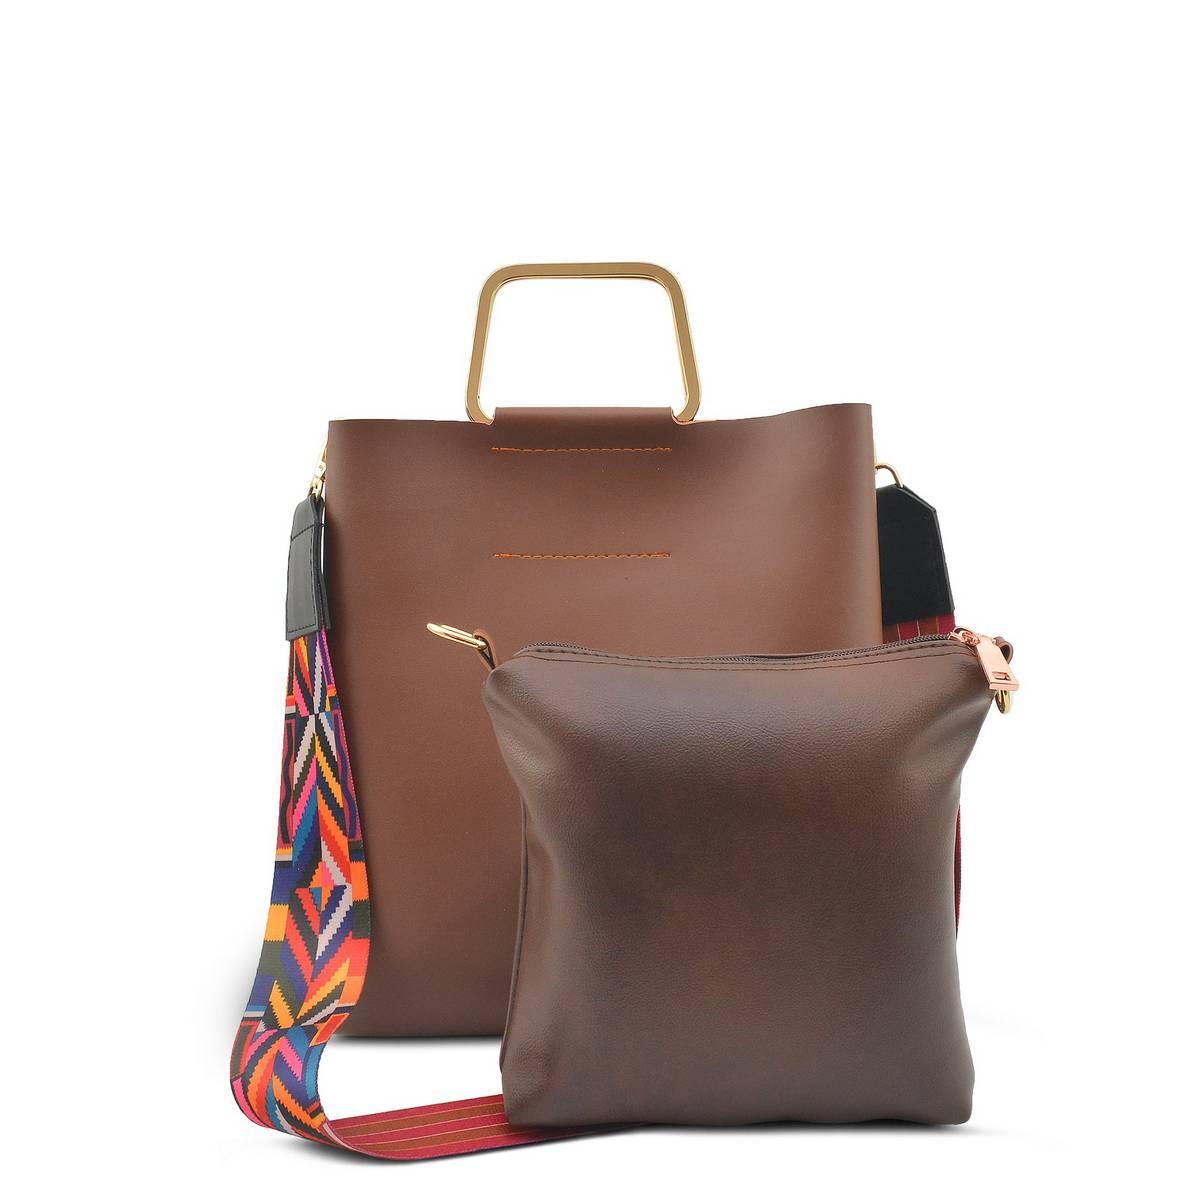 Astore Silver Aluminium Handle Colorful Fix Detachable Strap Faux Leather Two Pieces Brown Handbag and Shoulderbag